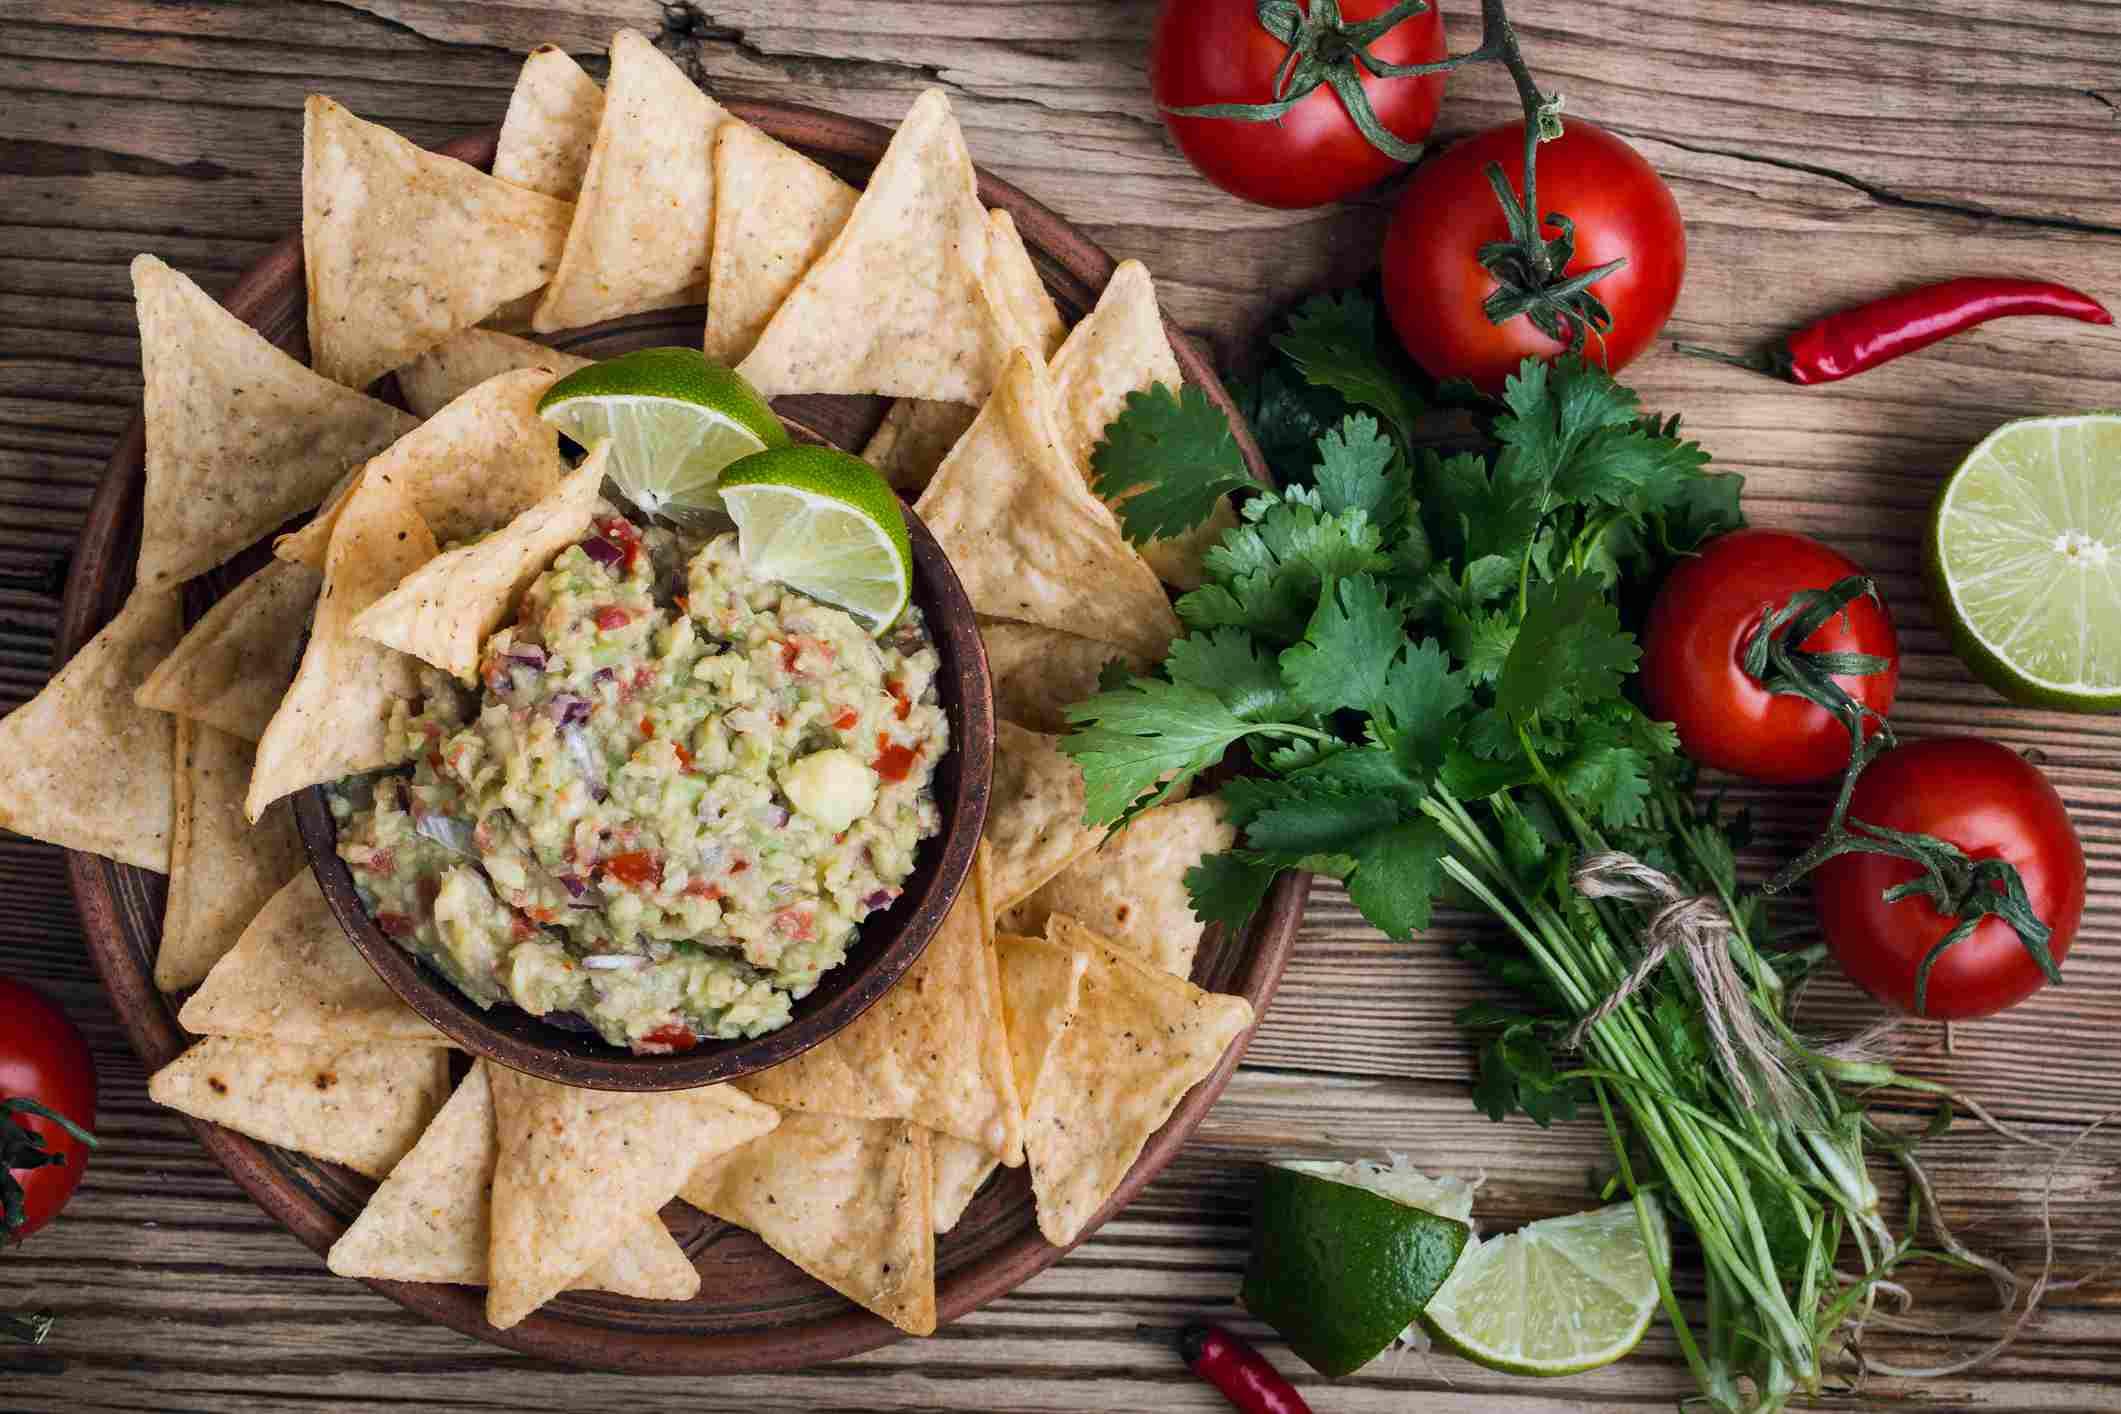 Tortilla chips and guacamole